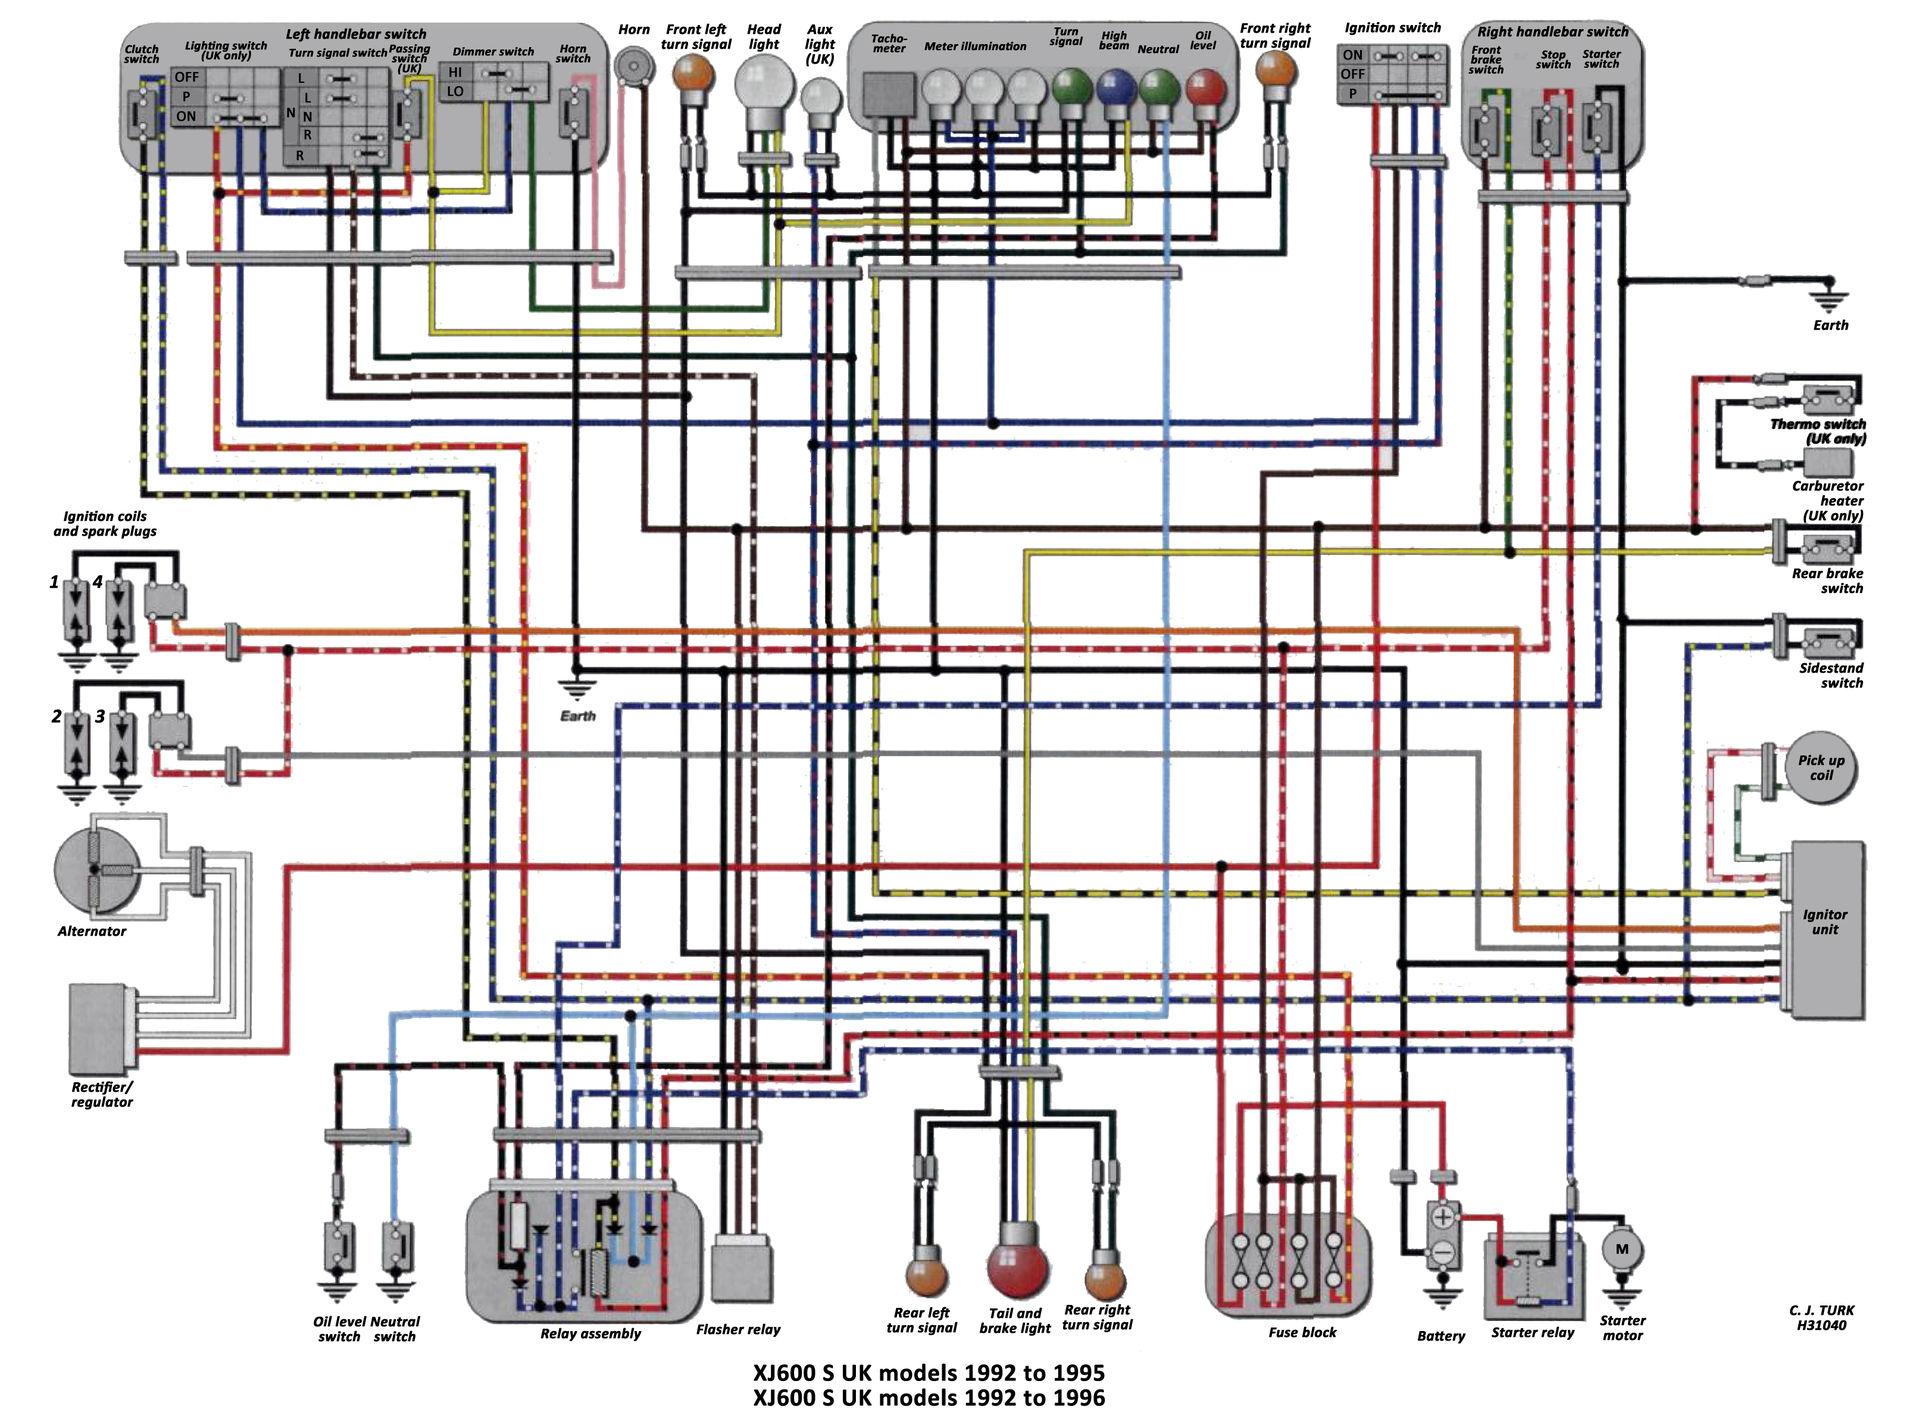 yamaha wiring diagram symbols 1996 chevy silverado stereo xj 600 library